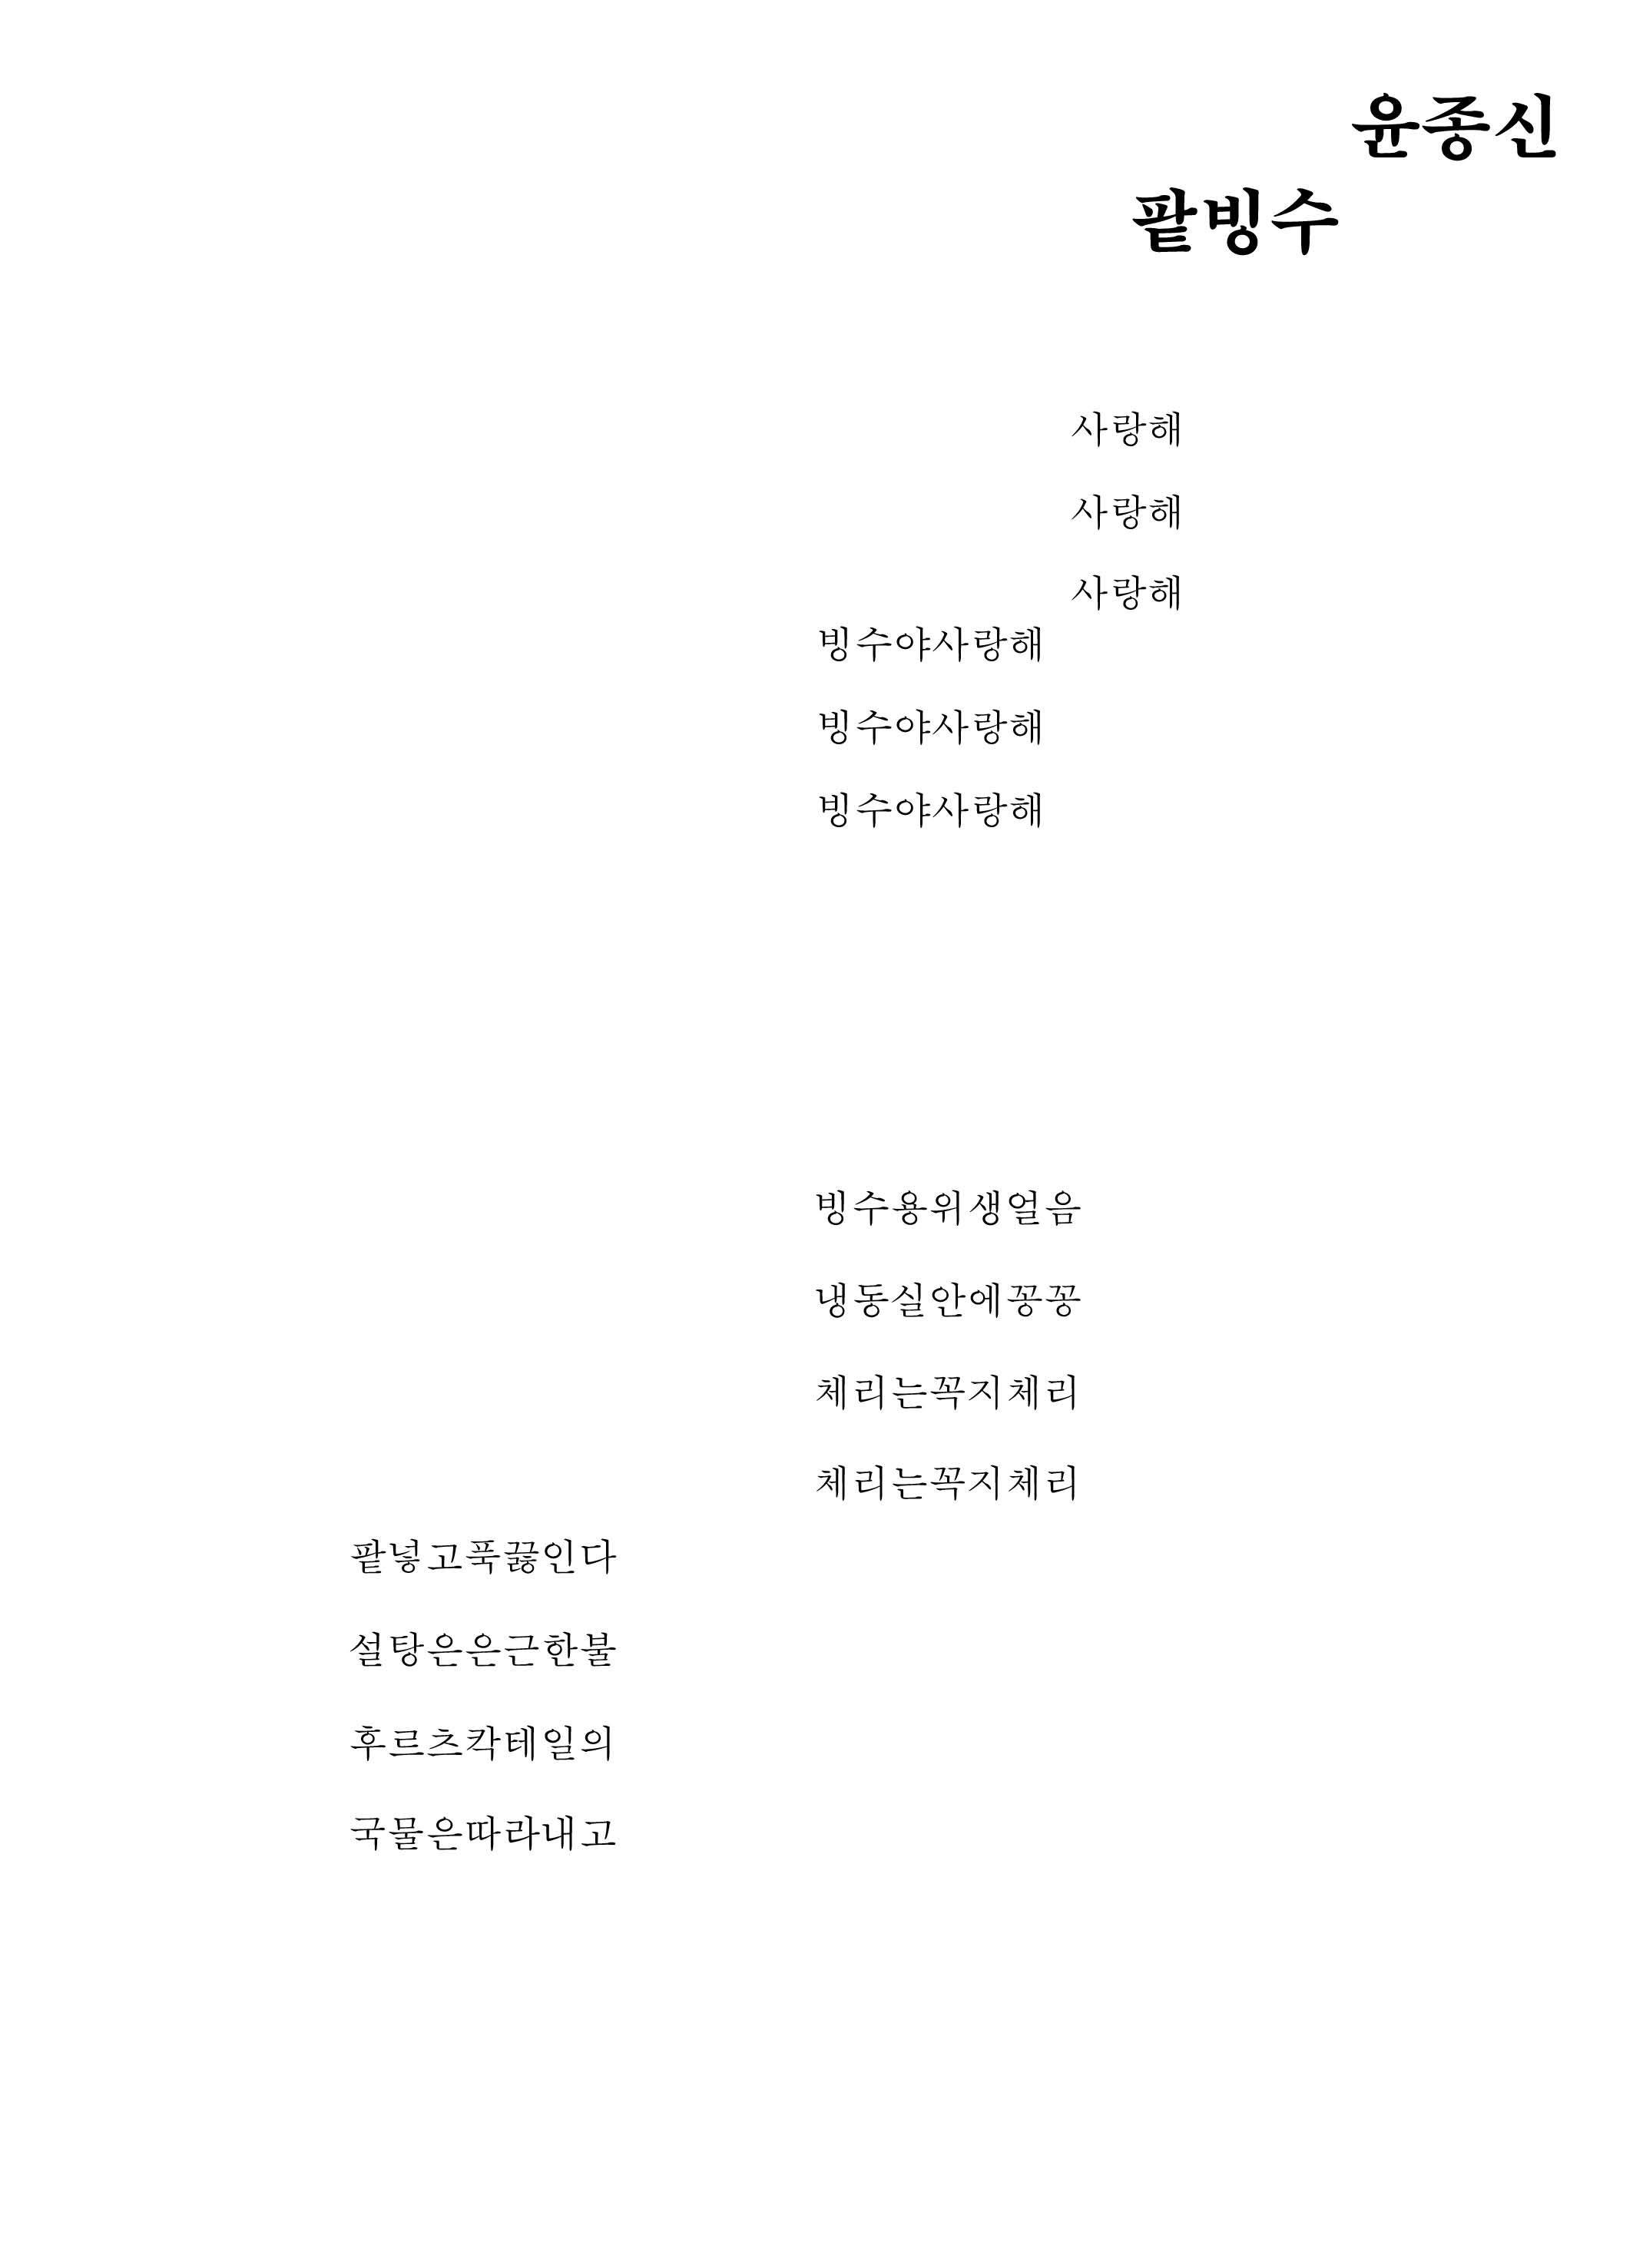 t212_KUa_안다혜_w11_03d